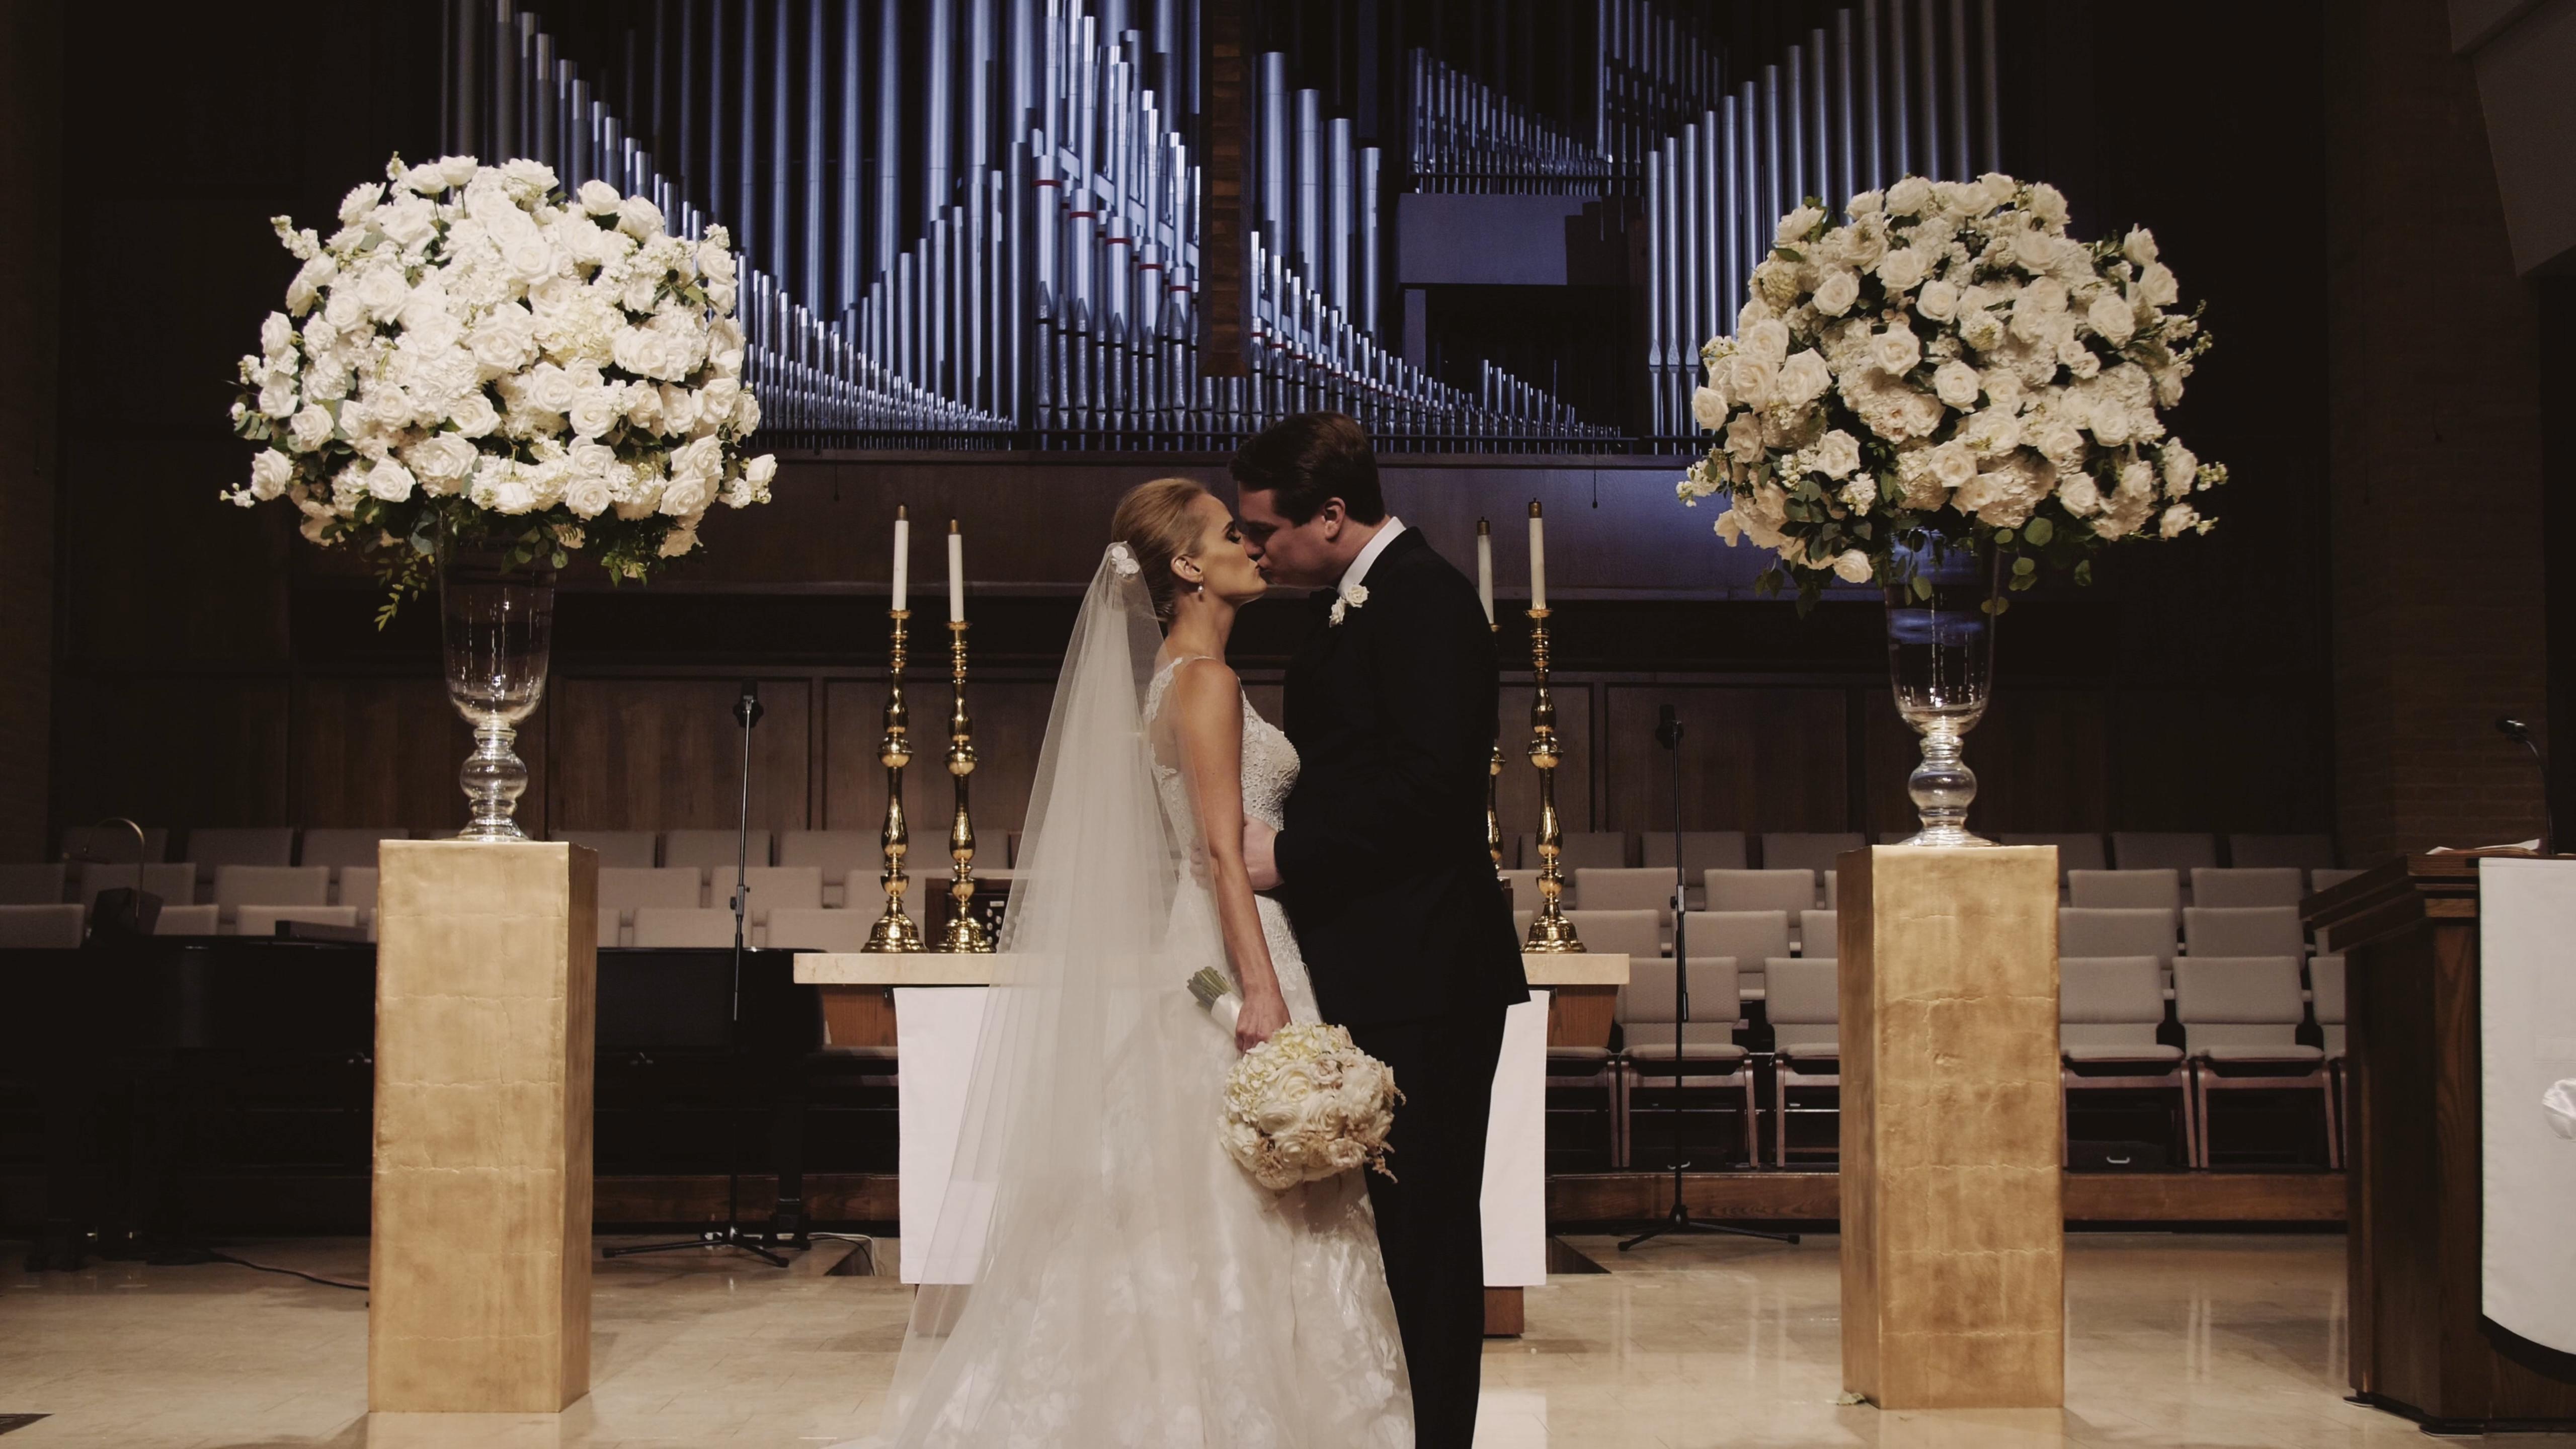 Anny Knight + Will Huddleston | Houston, Texas | The Corinthian